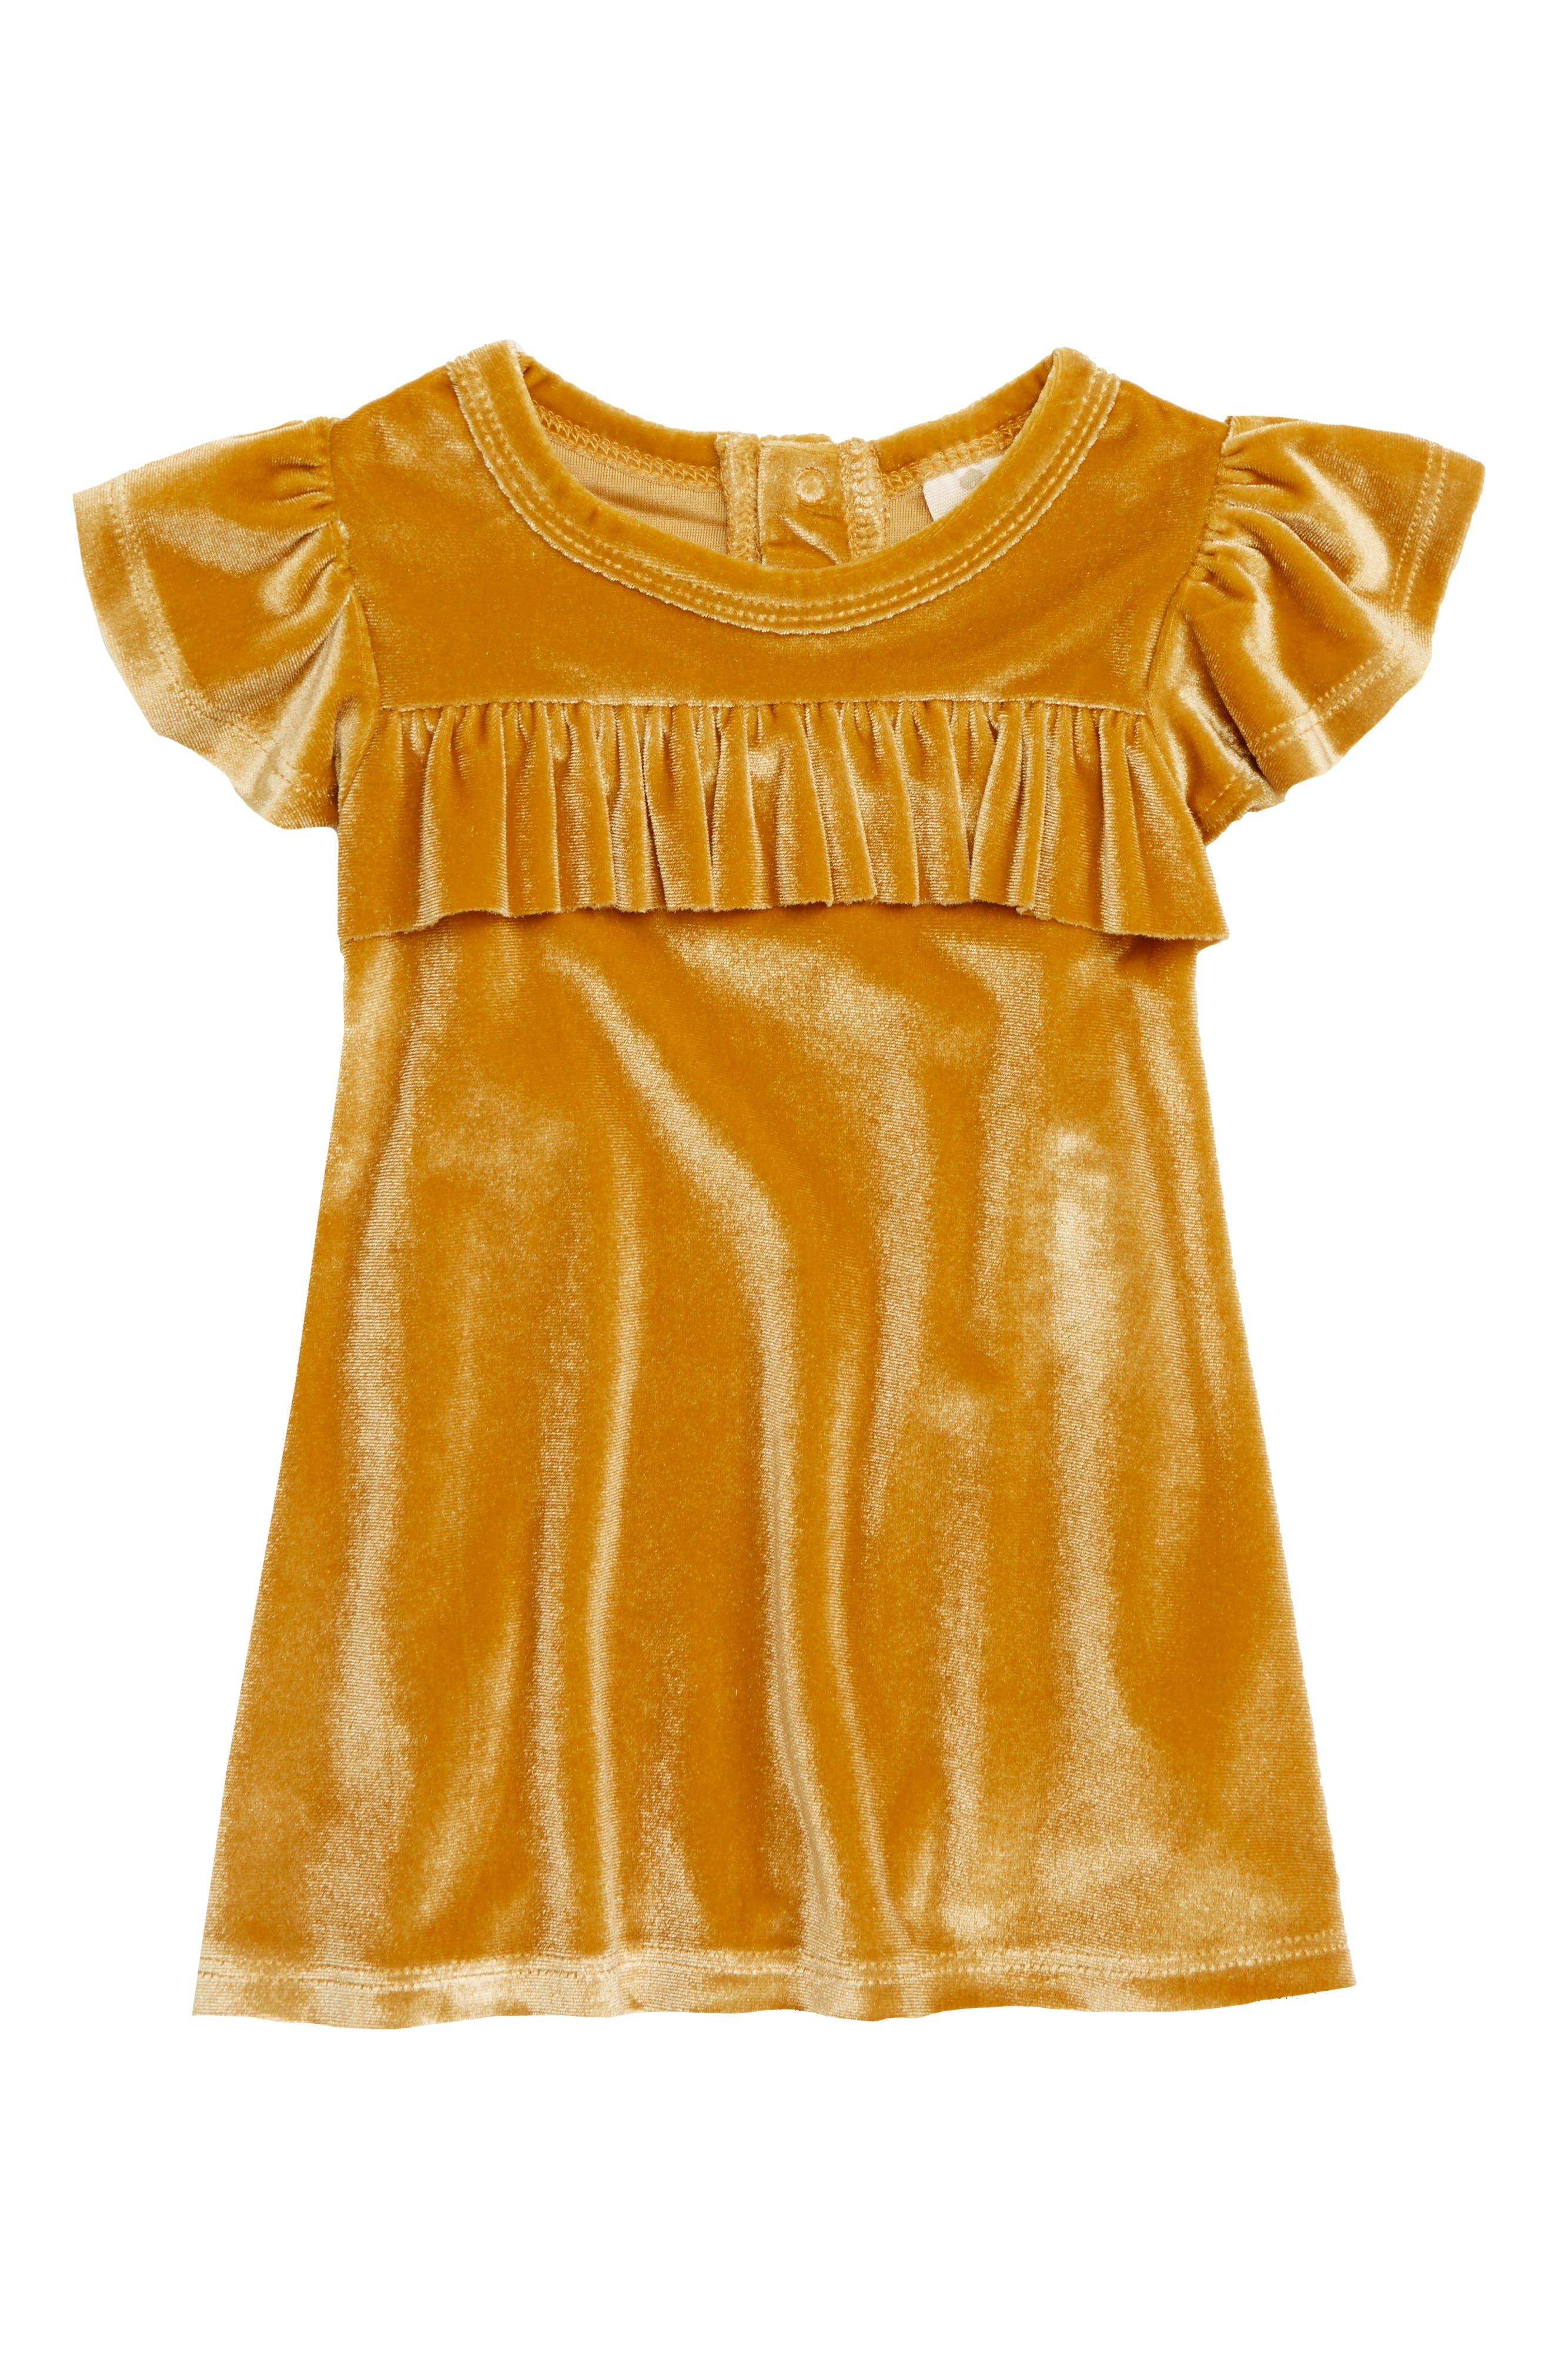 TUCKER + TATE,                             Velvet Ruffle Dress,                             Main thumbnail 1, color,                             701